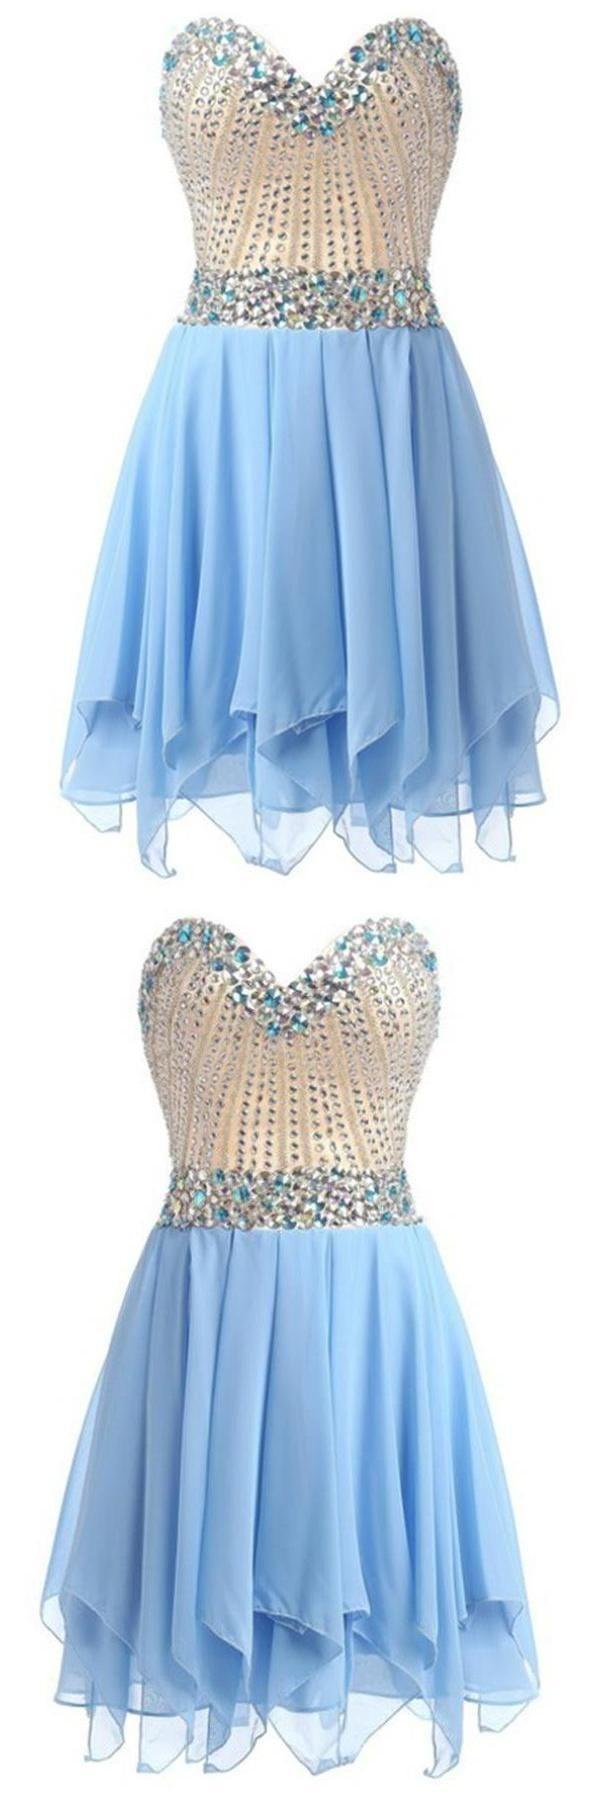 Cheap prom dresses cute prom dresses light blue prom dresses prom